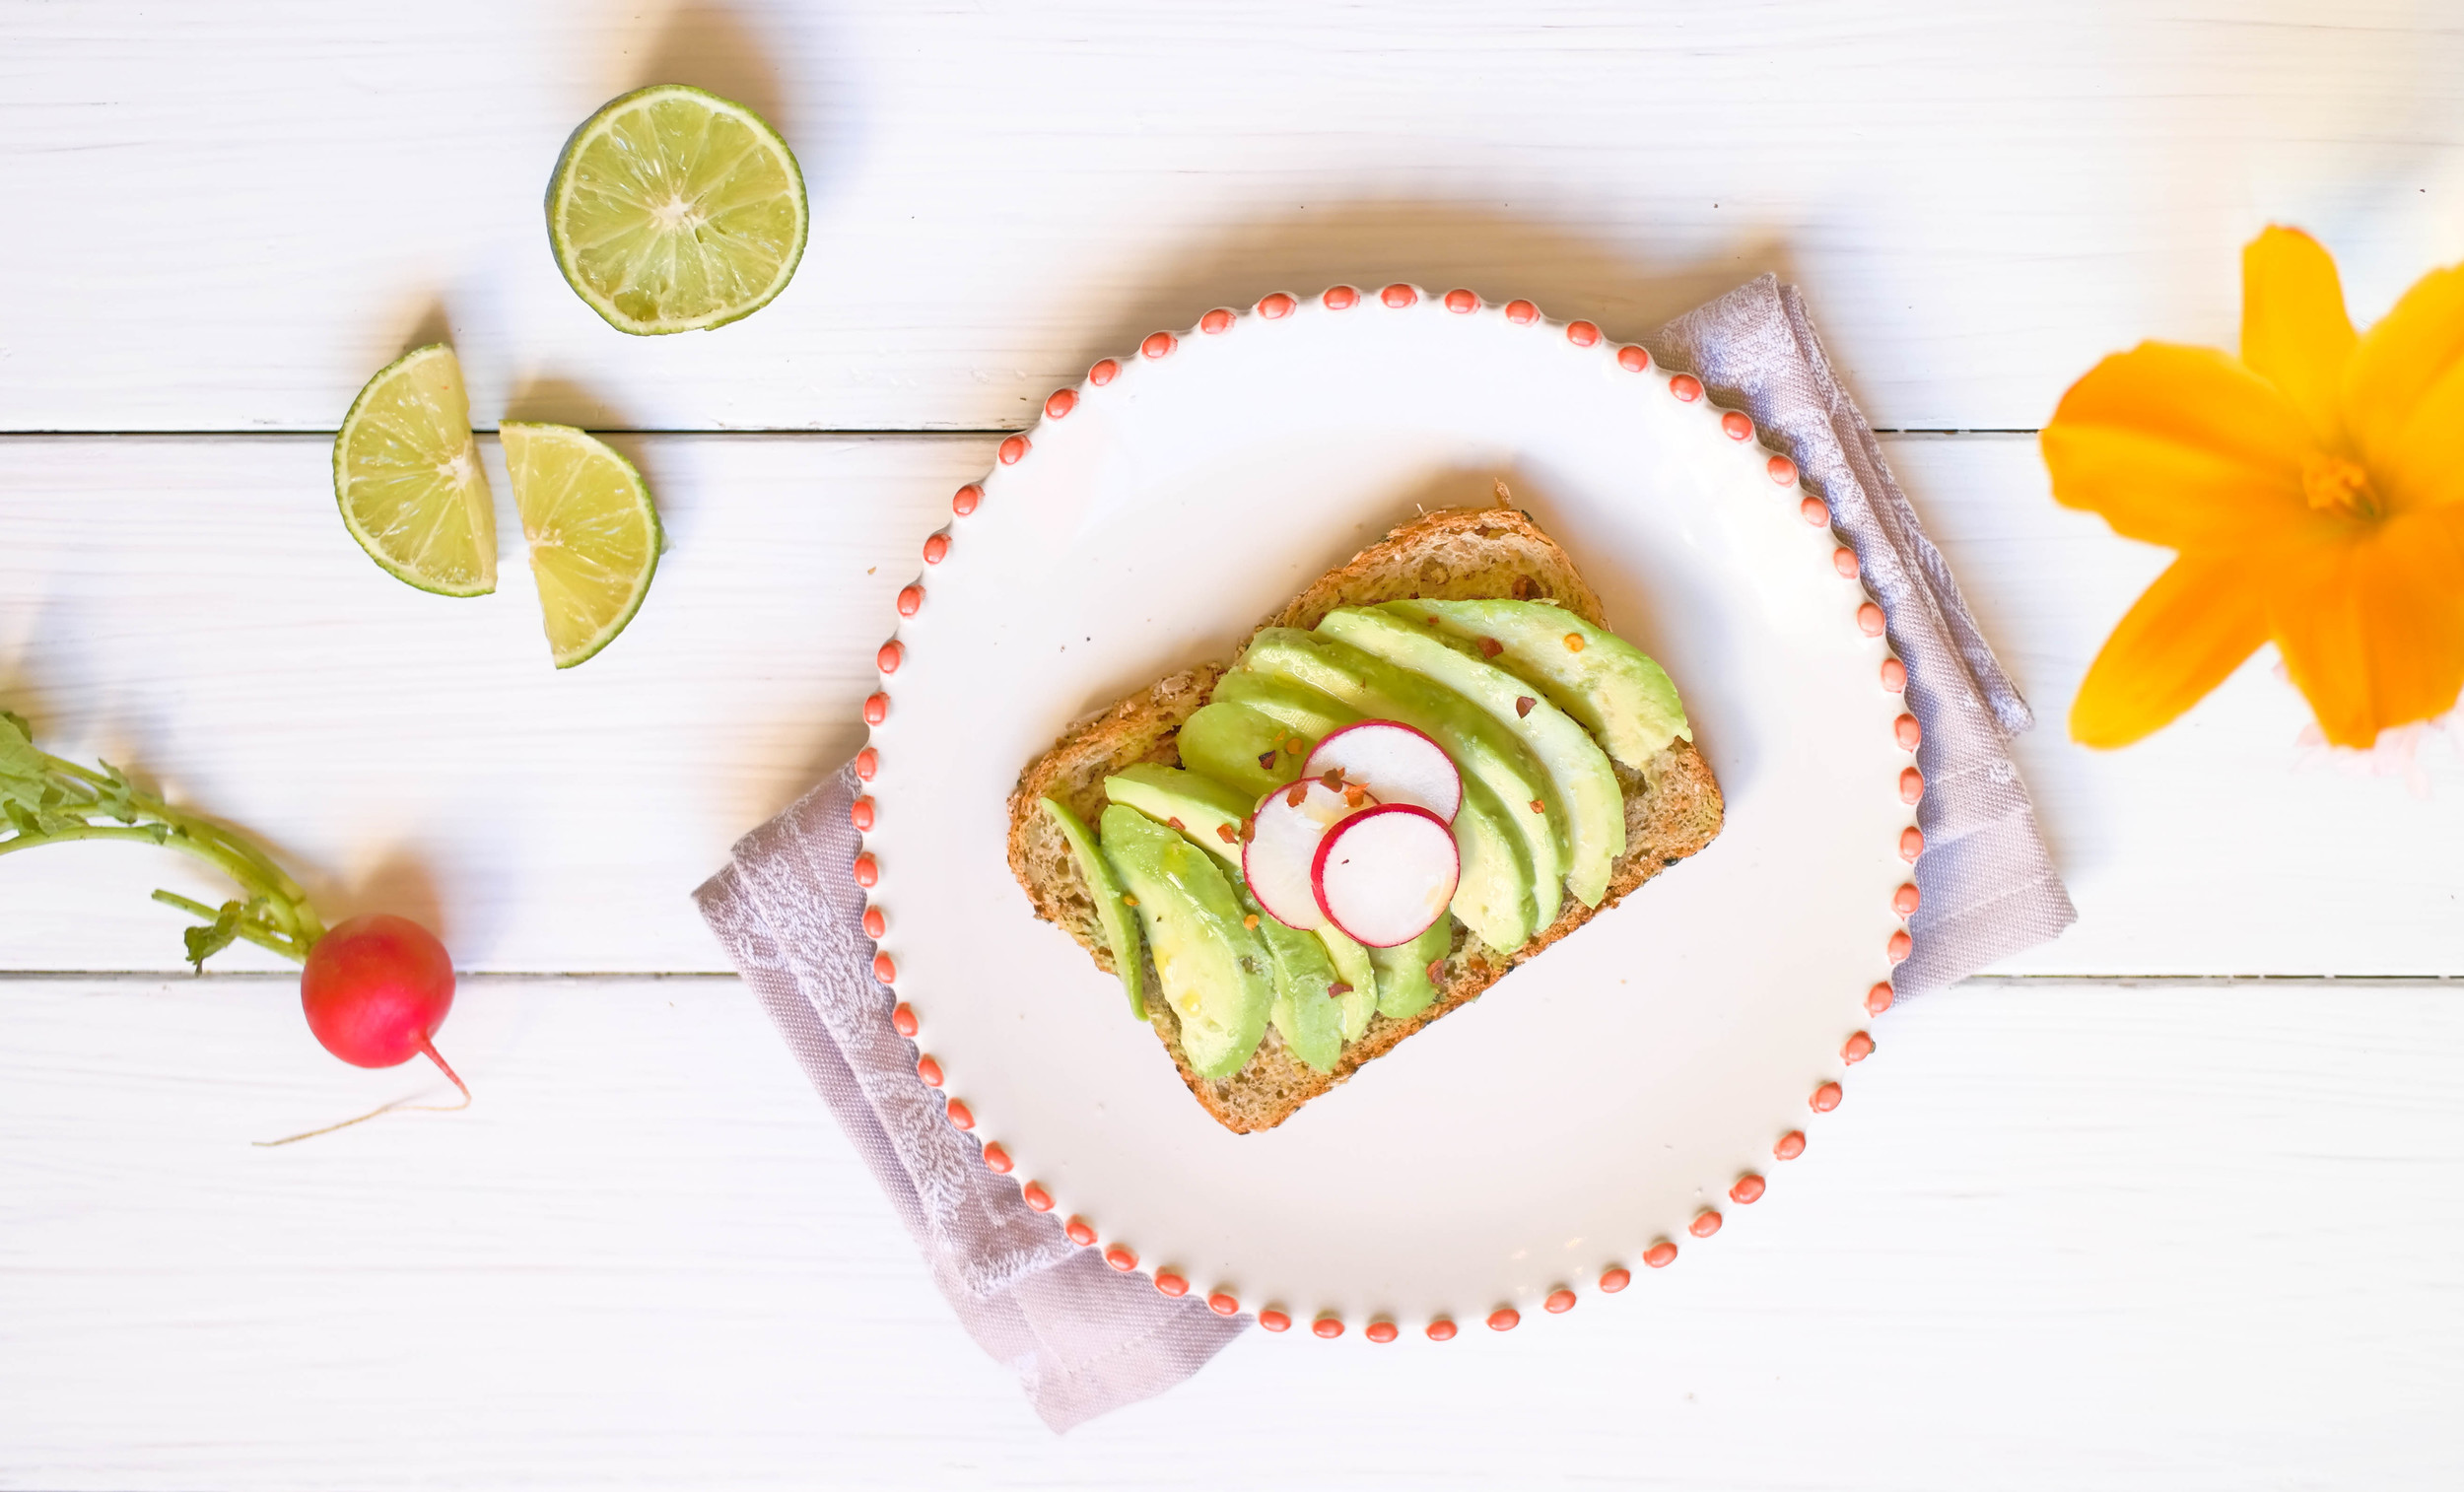 Spicy-Avocado-And-Lime-Toast | www.8thandlake.com